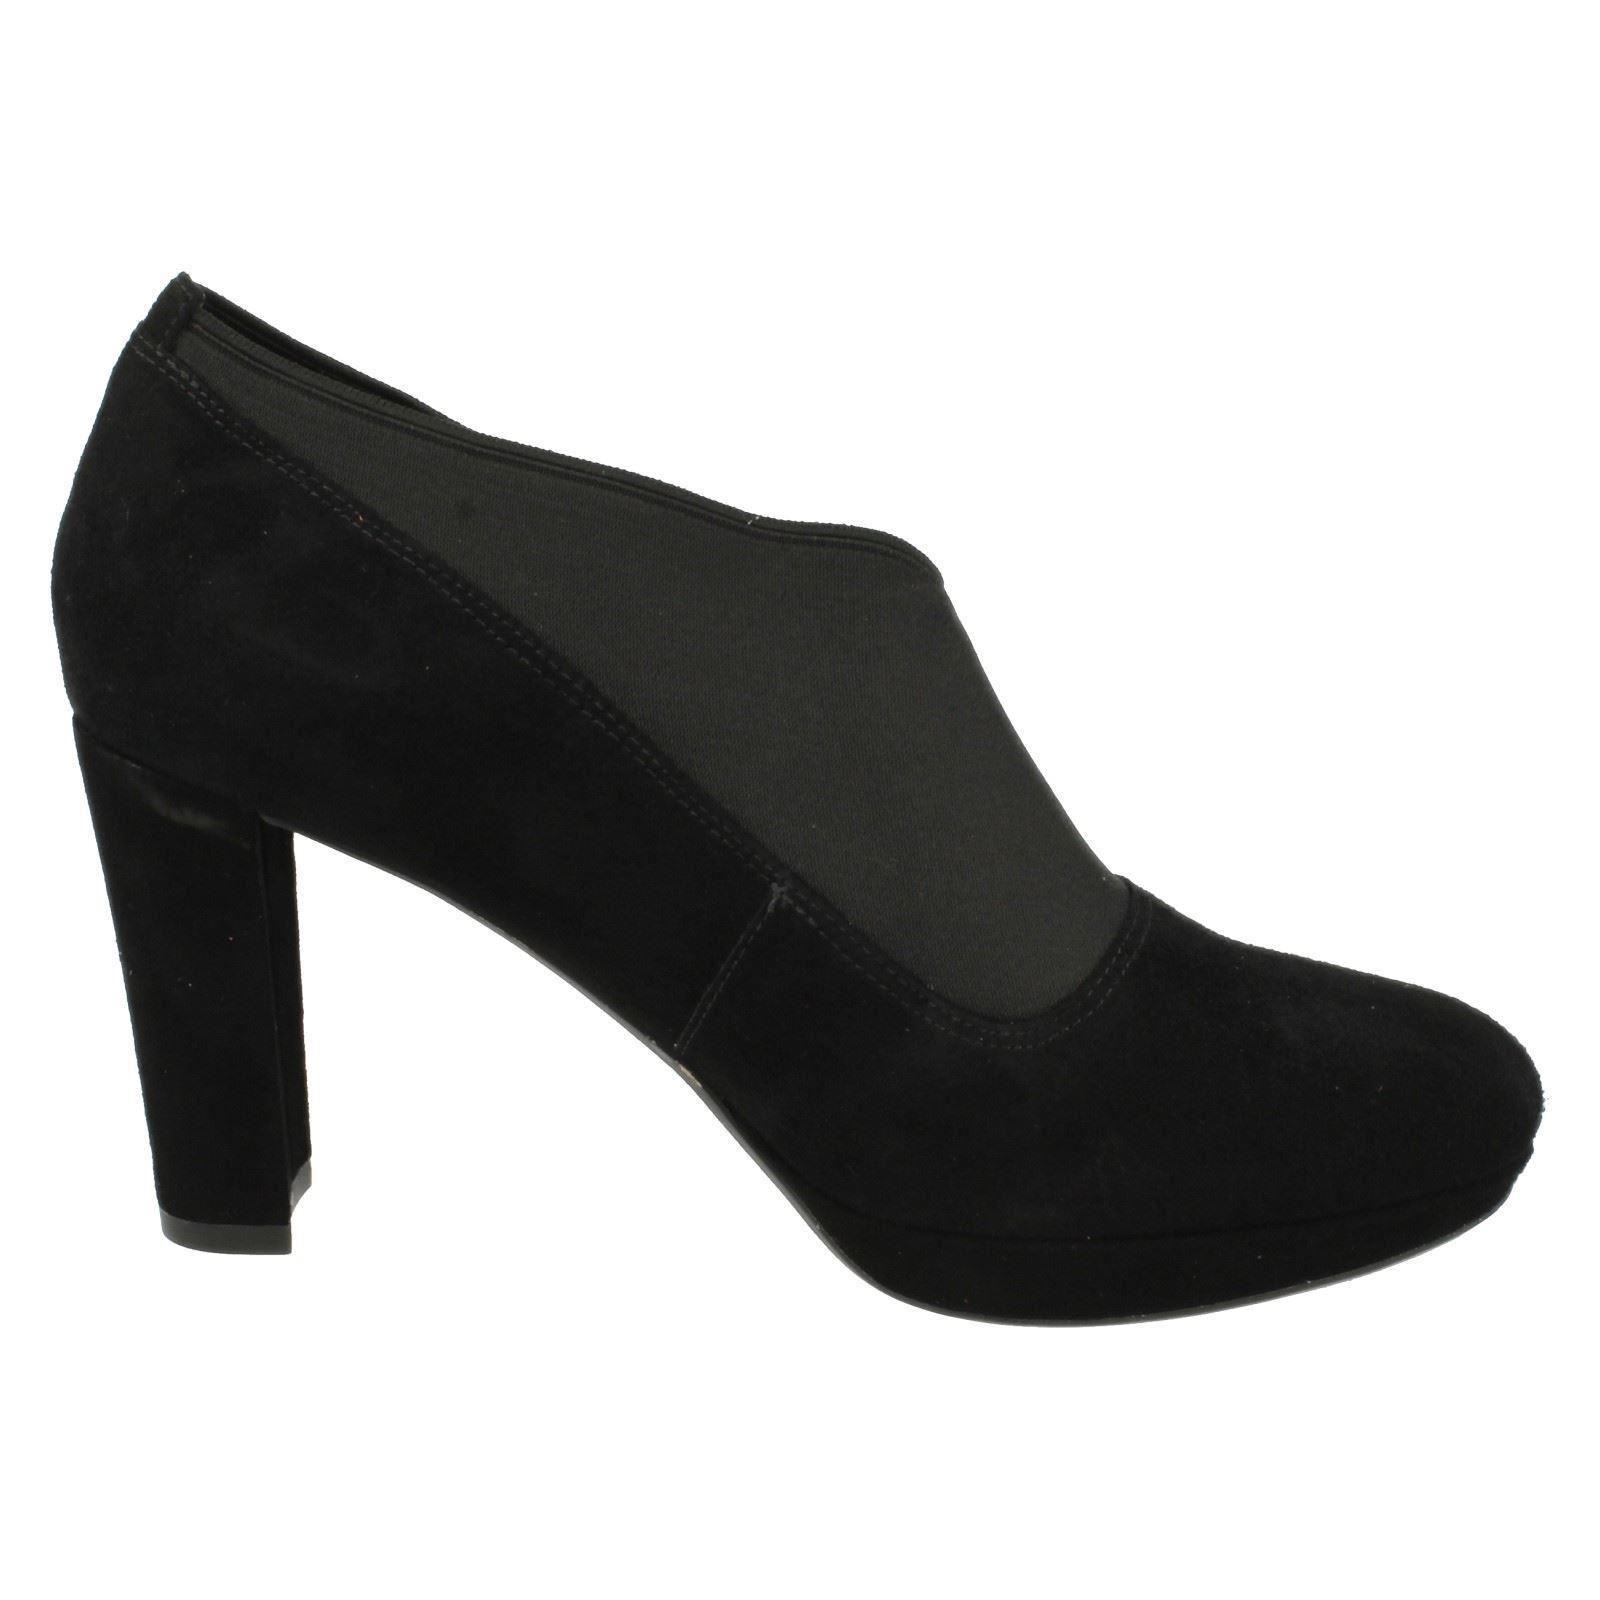 SALE LADIES COURT SHOES SUEDE SLIP SHOES ON SMART FORMAL COURT SHOES SLIP SIZE KENDRA MIX 24c482